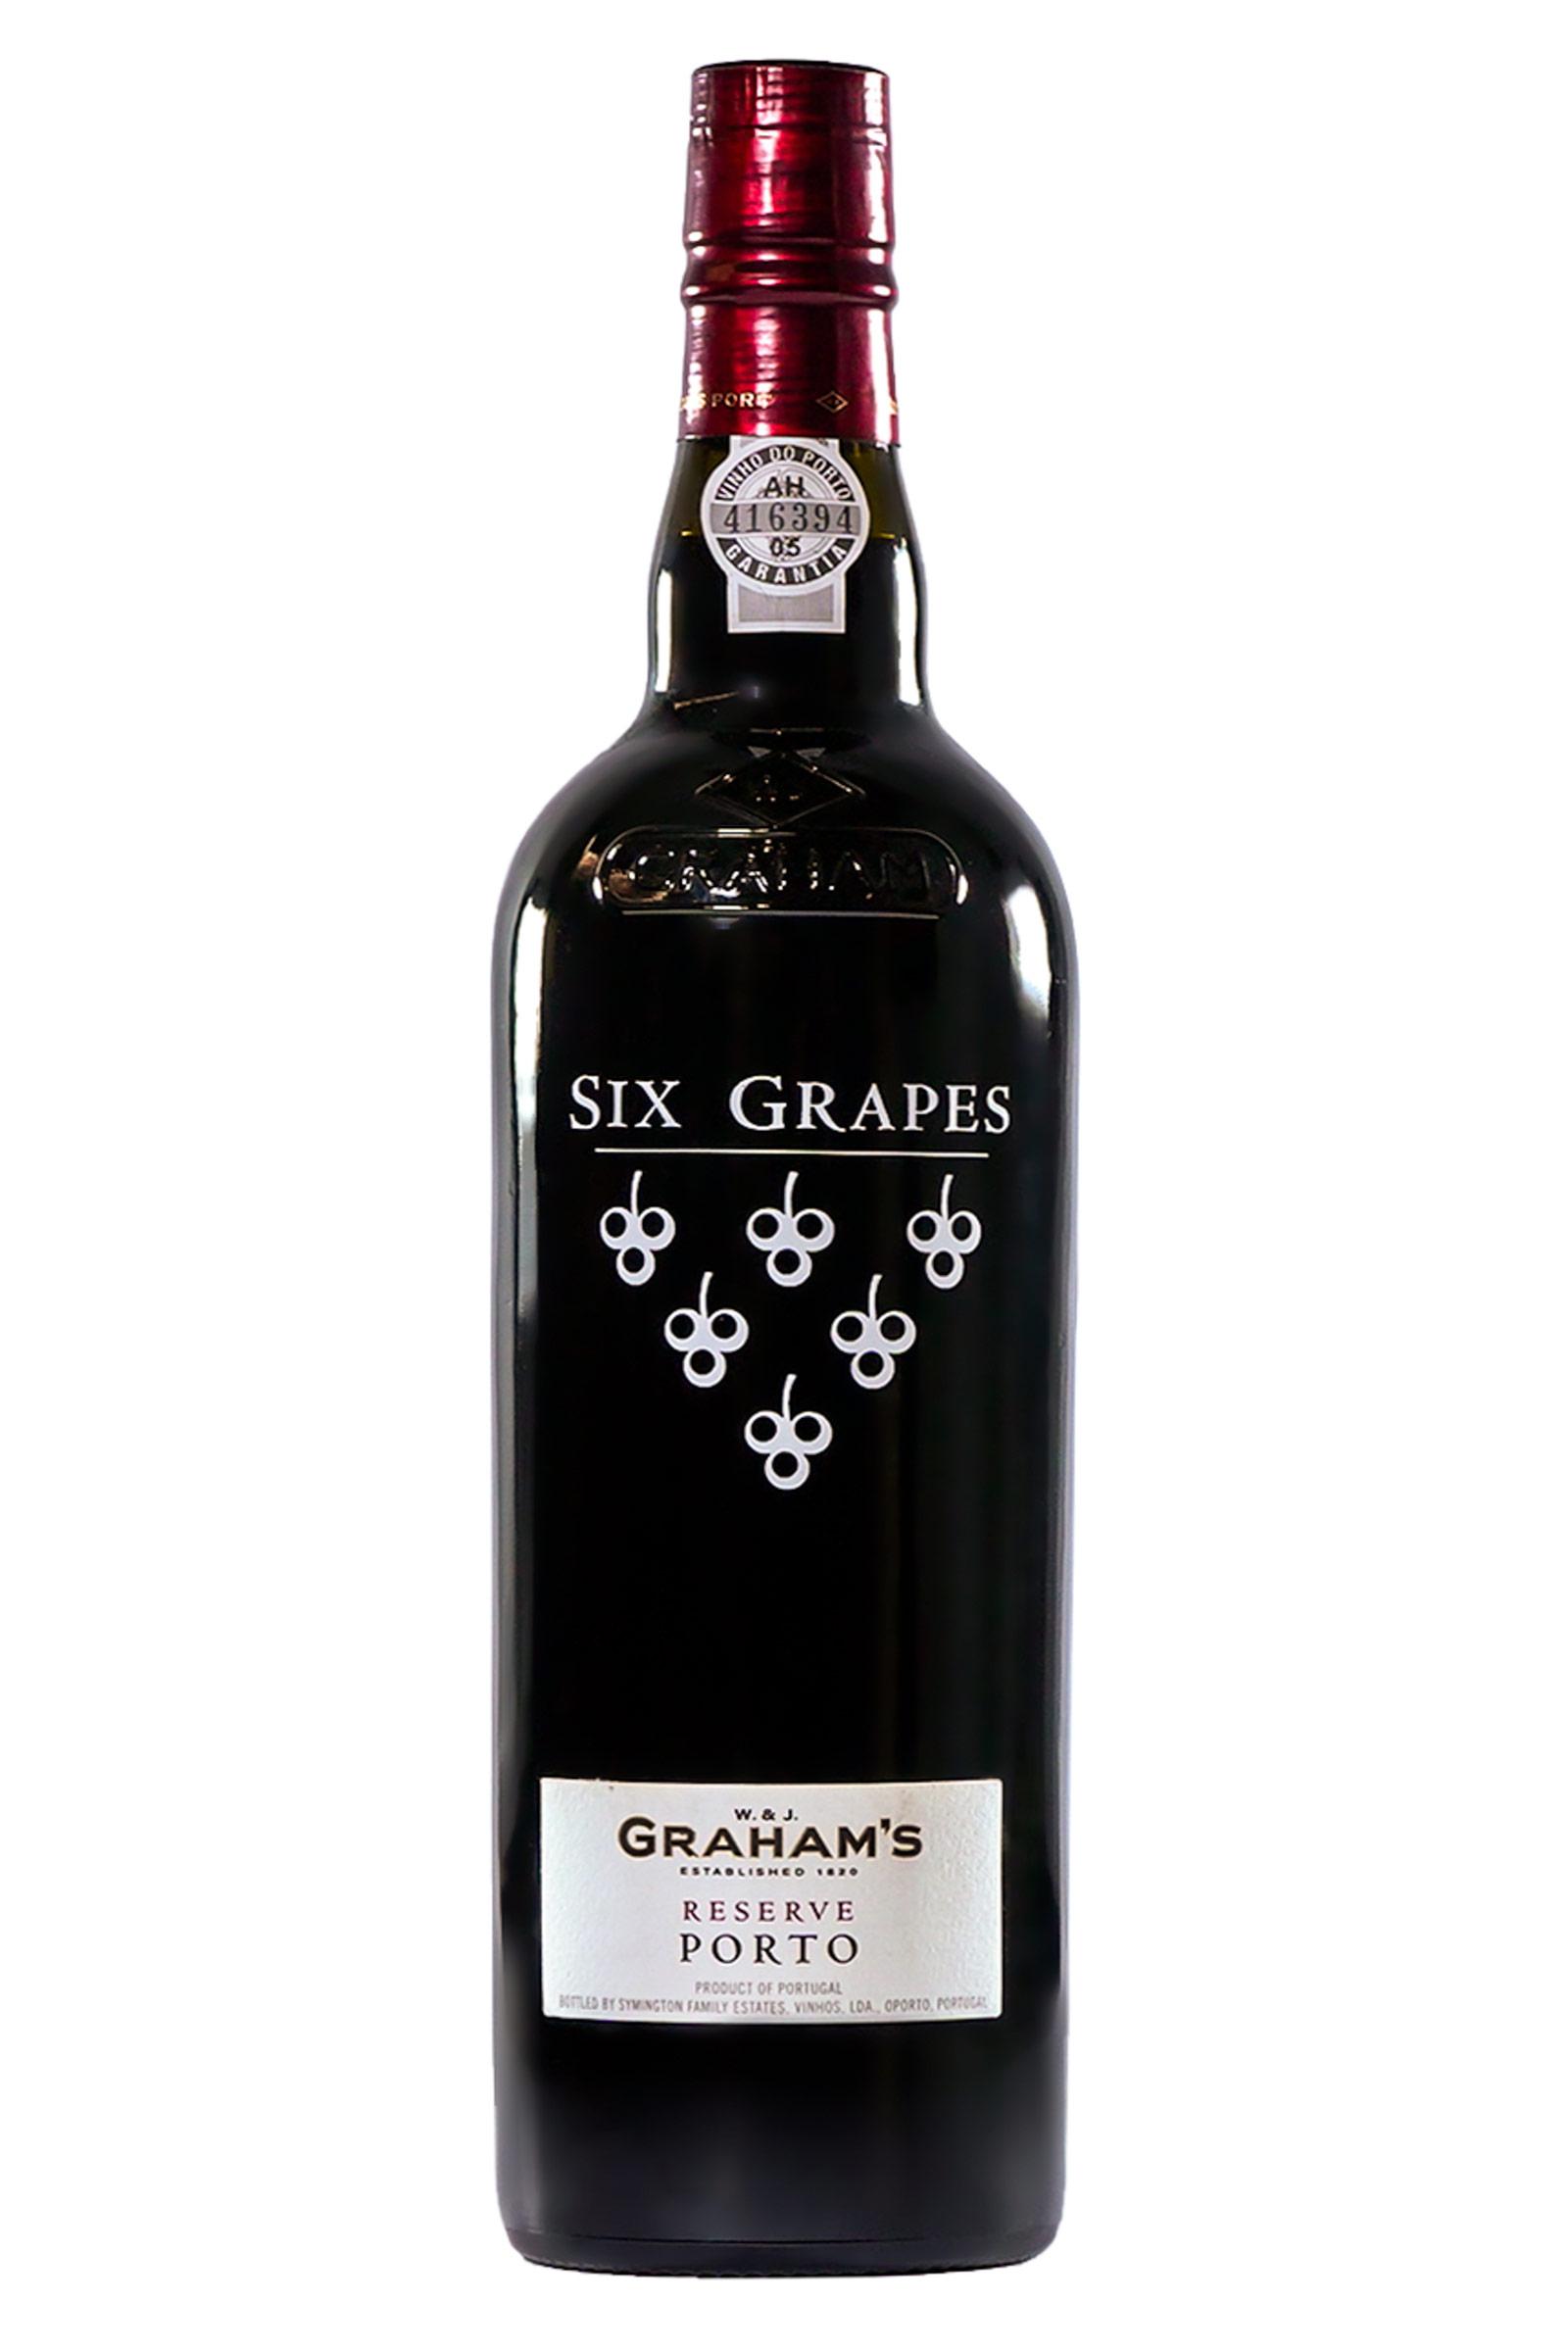 Oporto Graham's Six Grapes 750ml